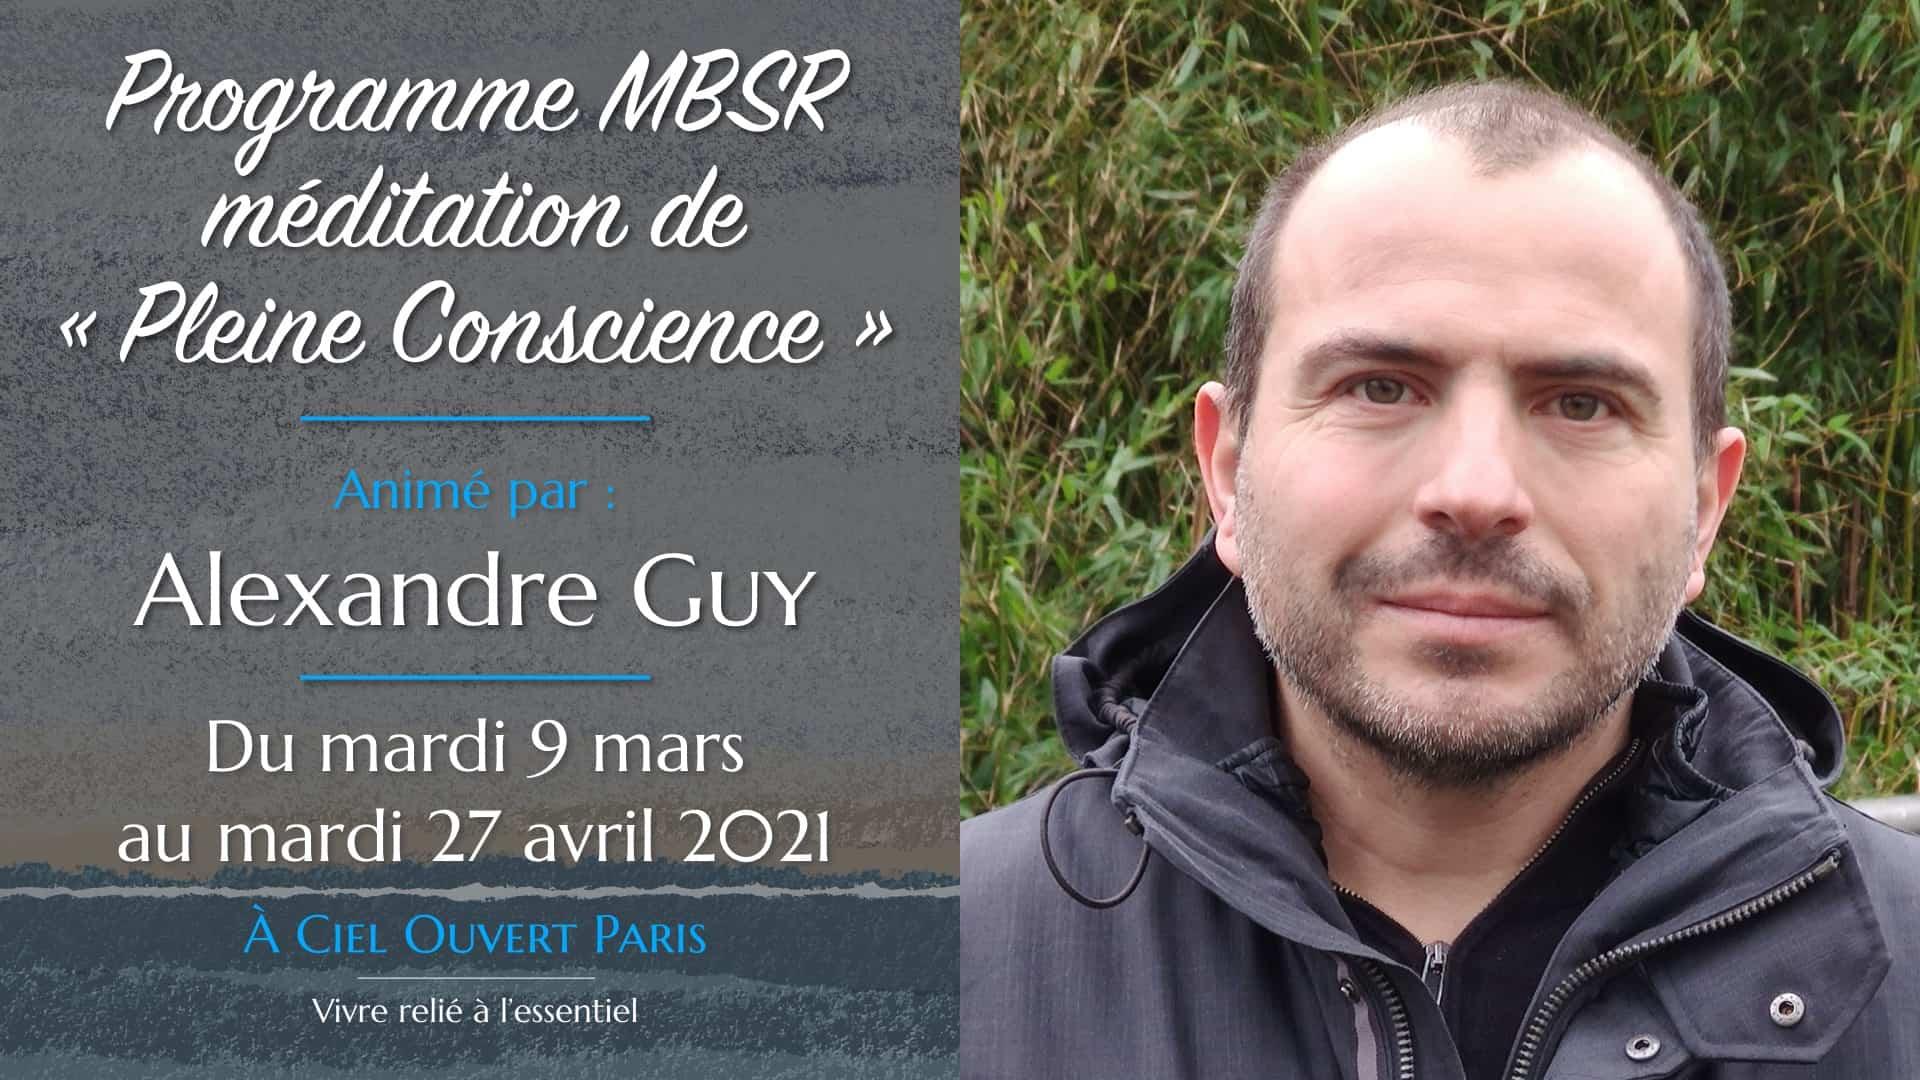 Programme MBSR – Alexandre Guy